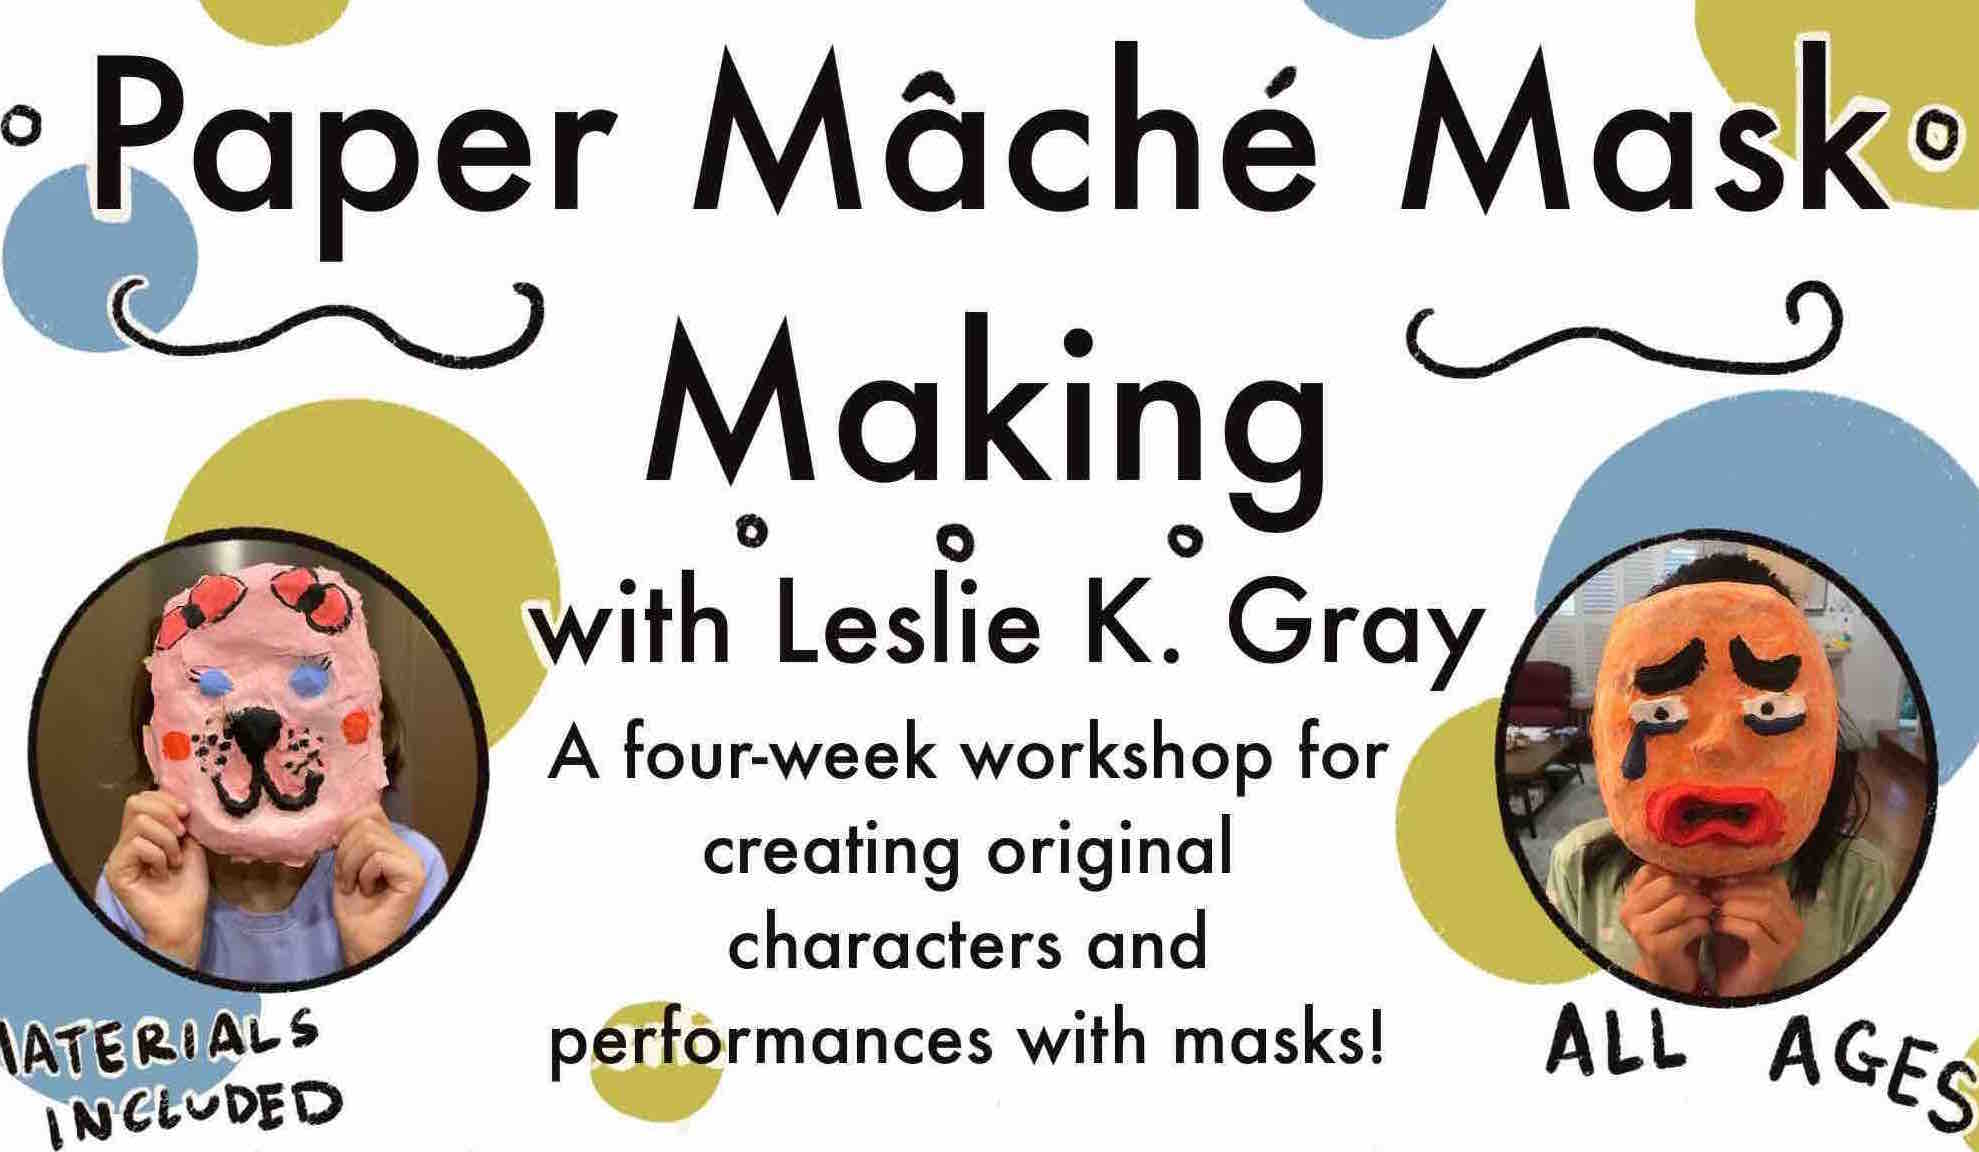 Paper Mache Mask Making Workshop